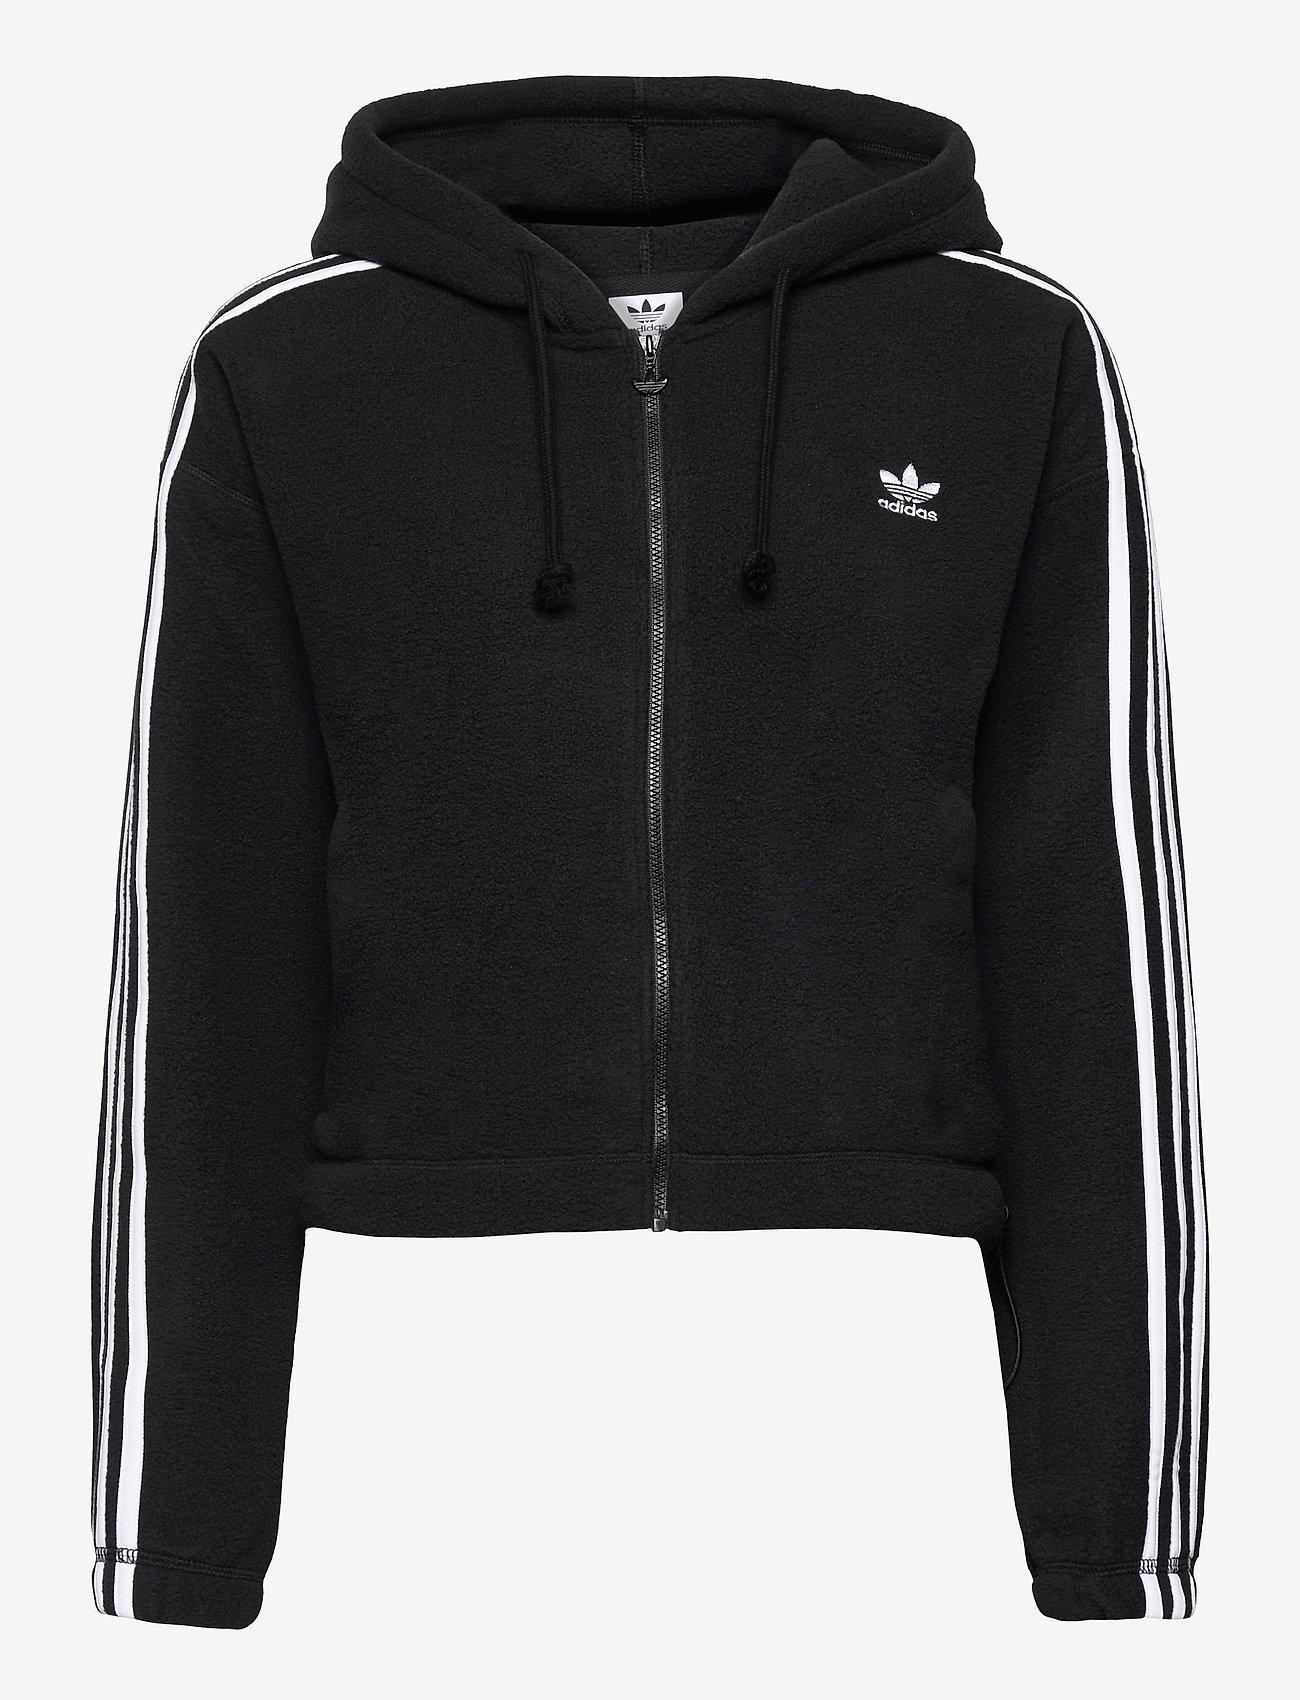 adidas Originals - Adicolor Classics Polar Fleece Full-Zip Hoodie W - fleece - black - 1